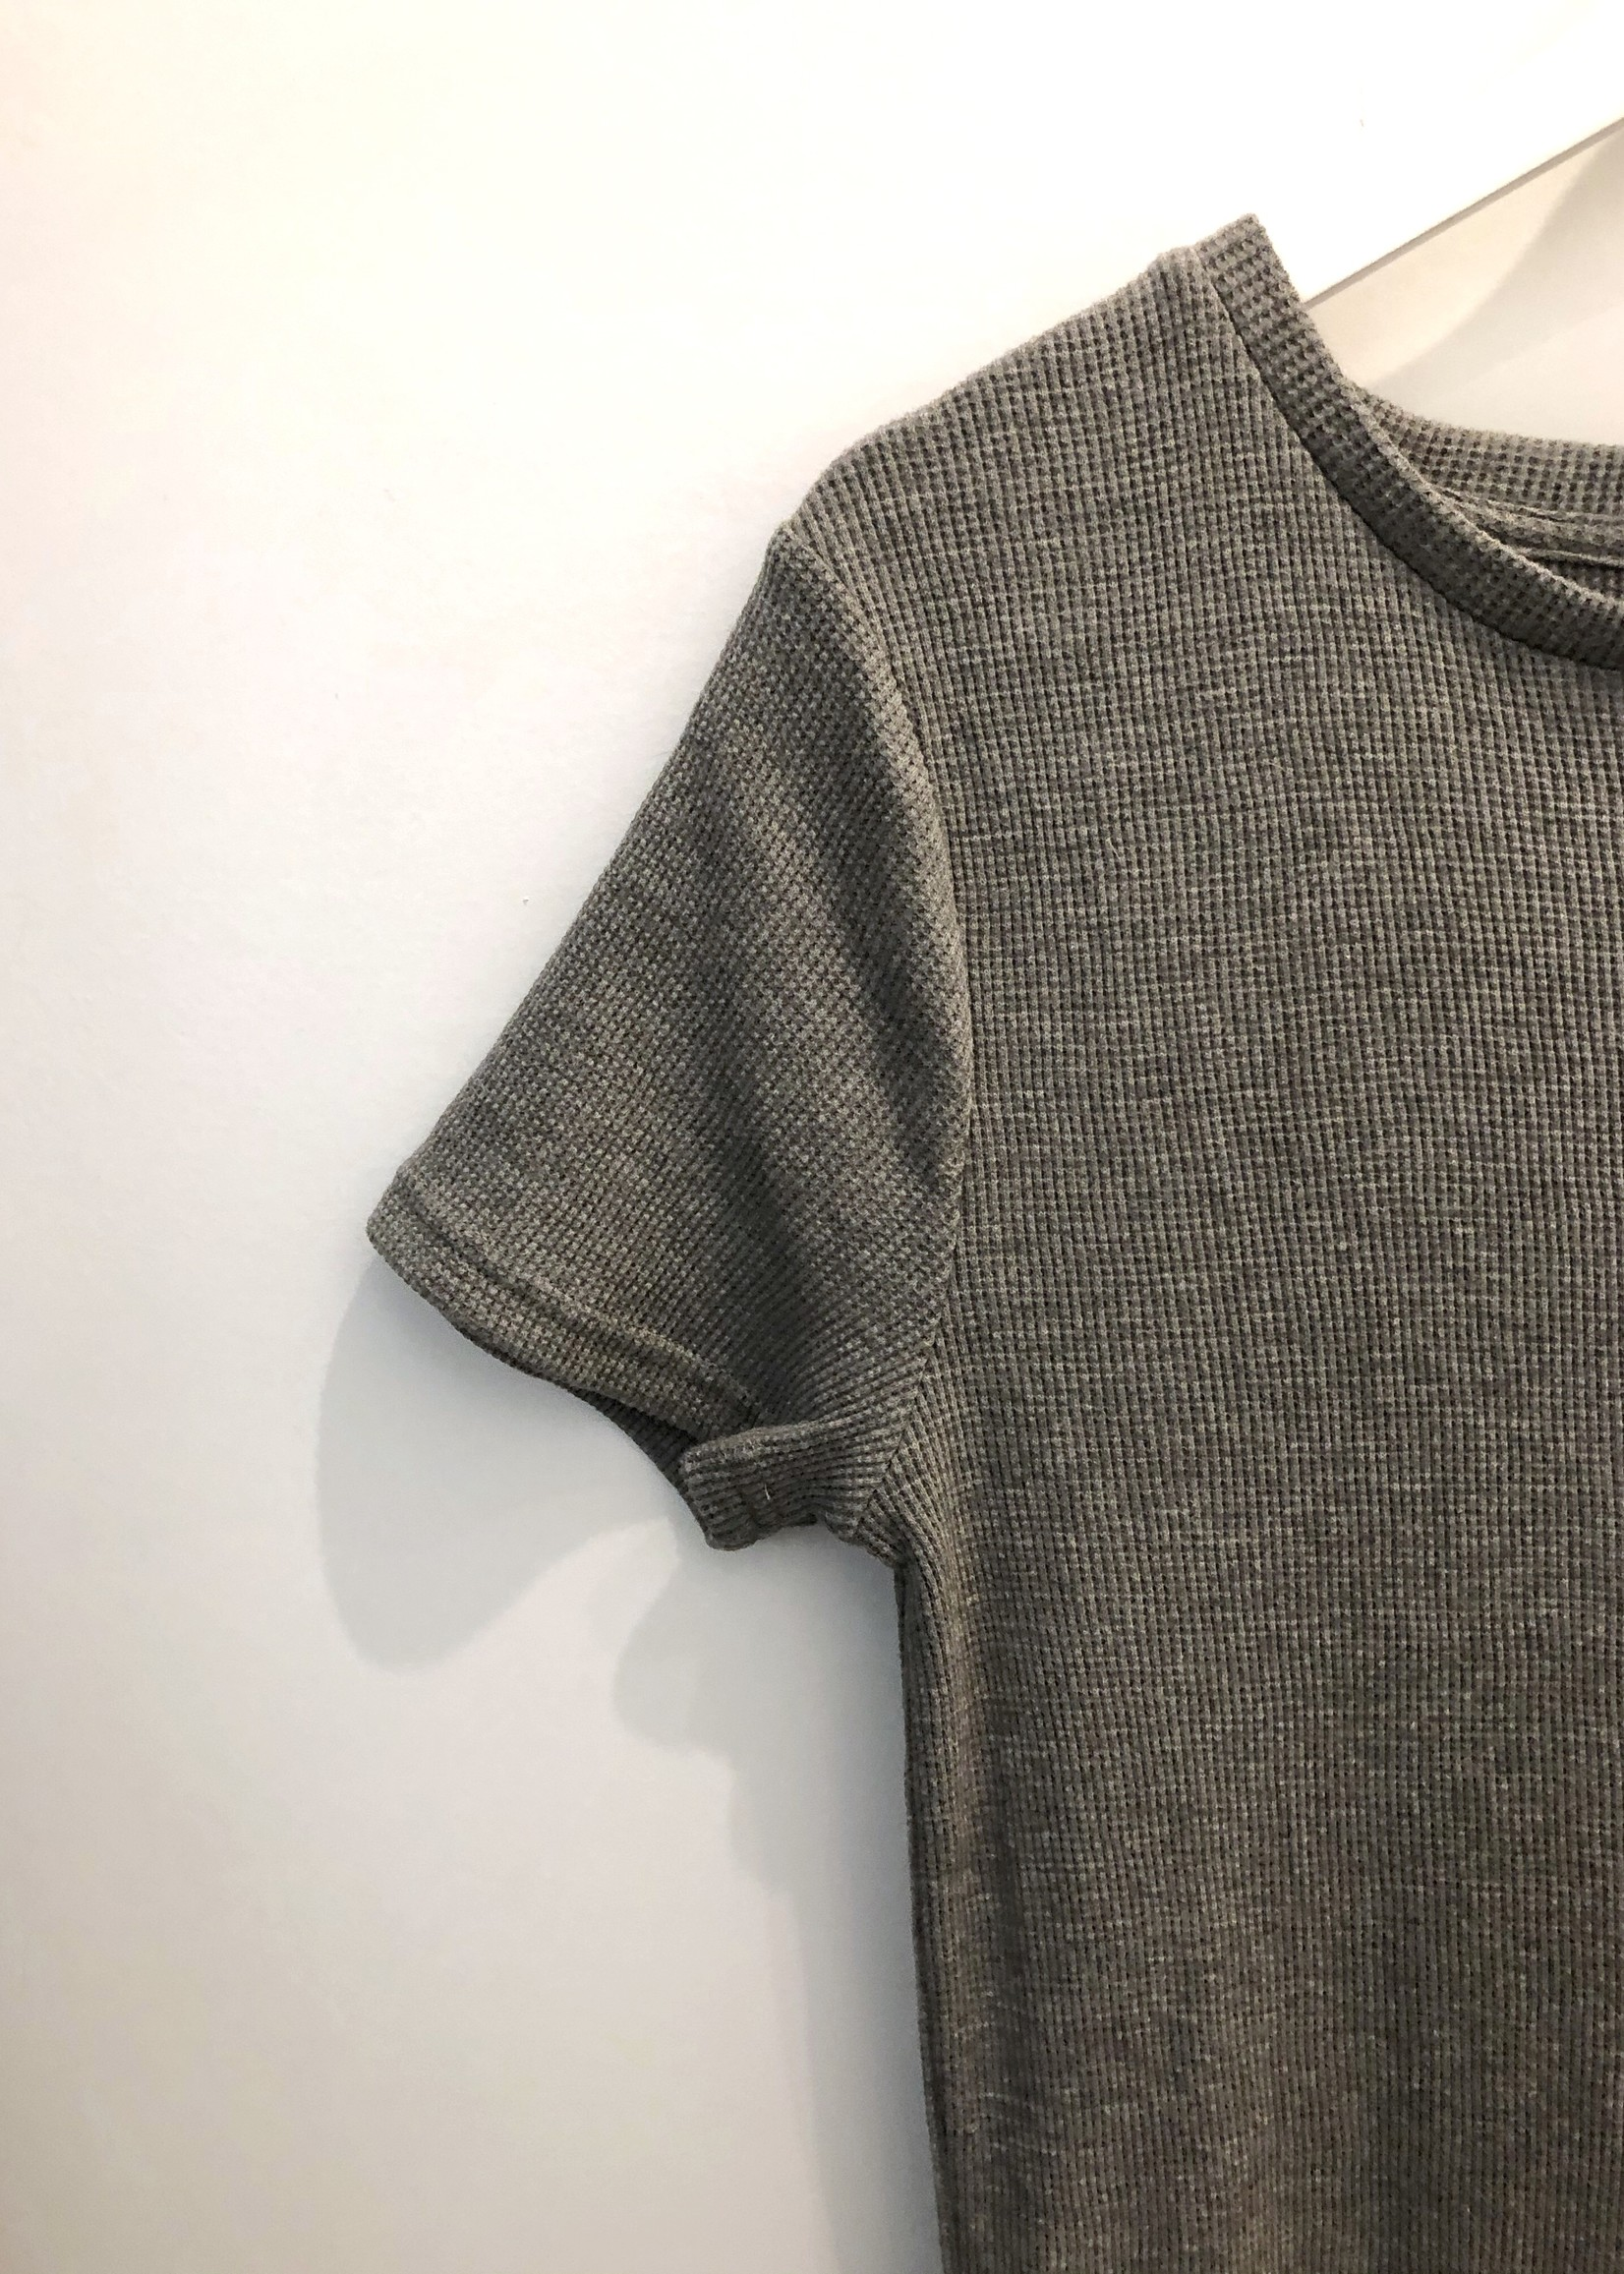 LeBLANC finds Waffle Knit Maxi Dress